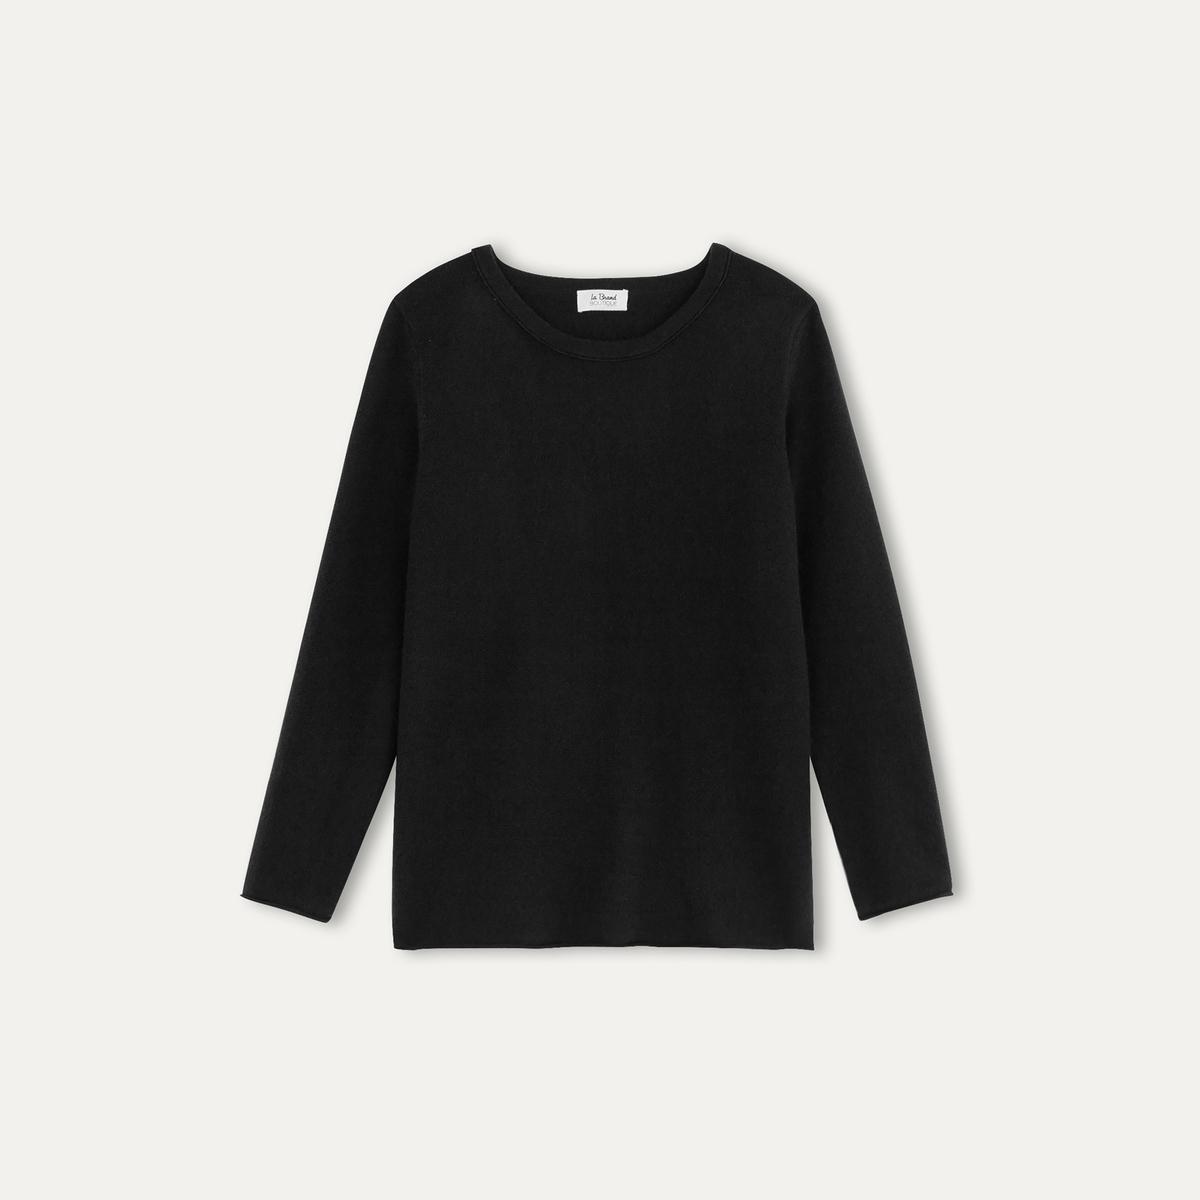 Пуловер HANNAH, 100% кашемир от La Redoute